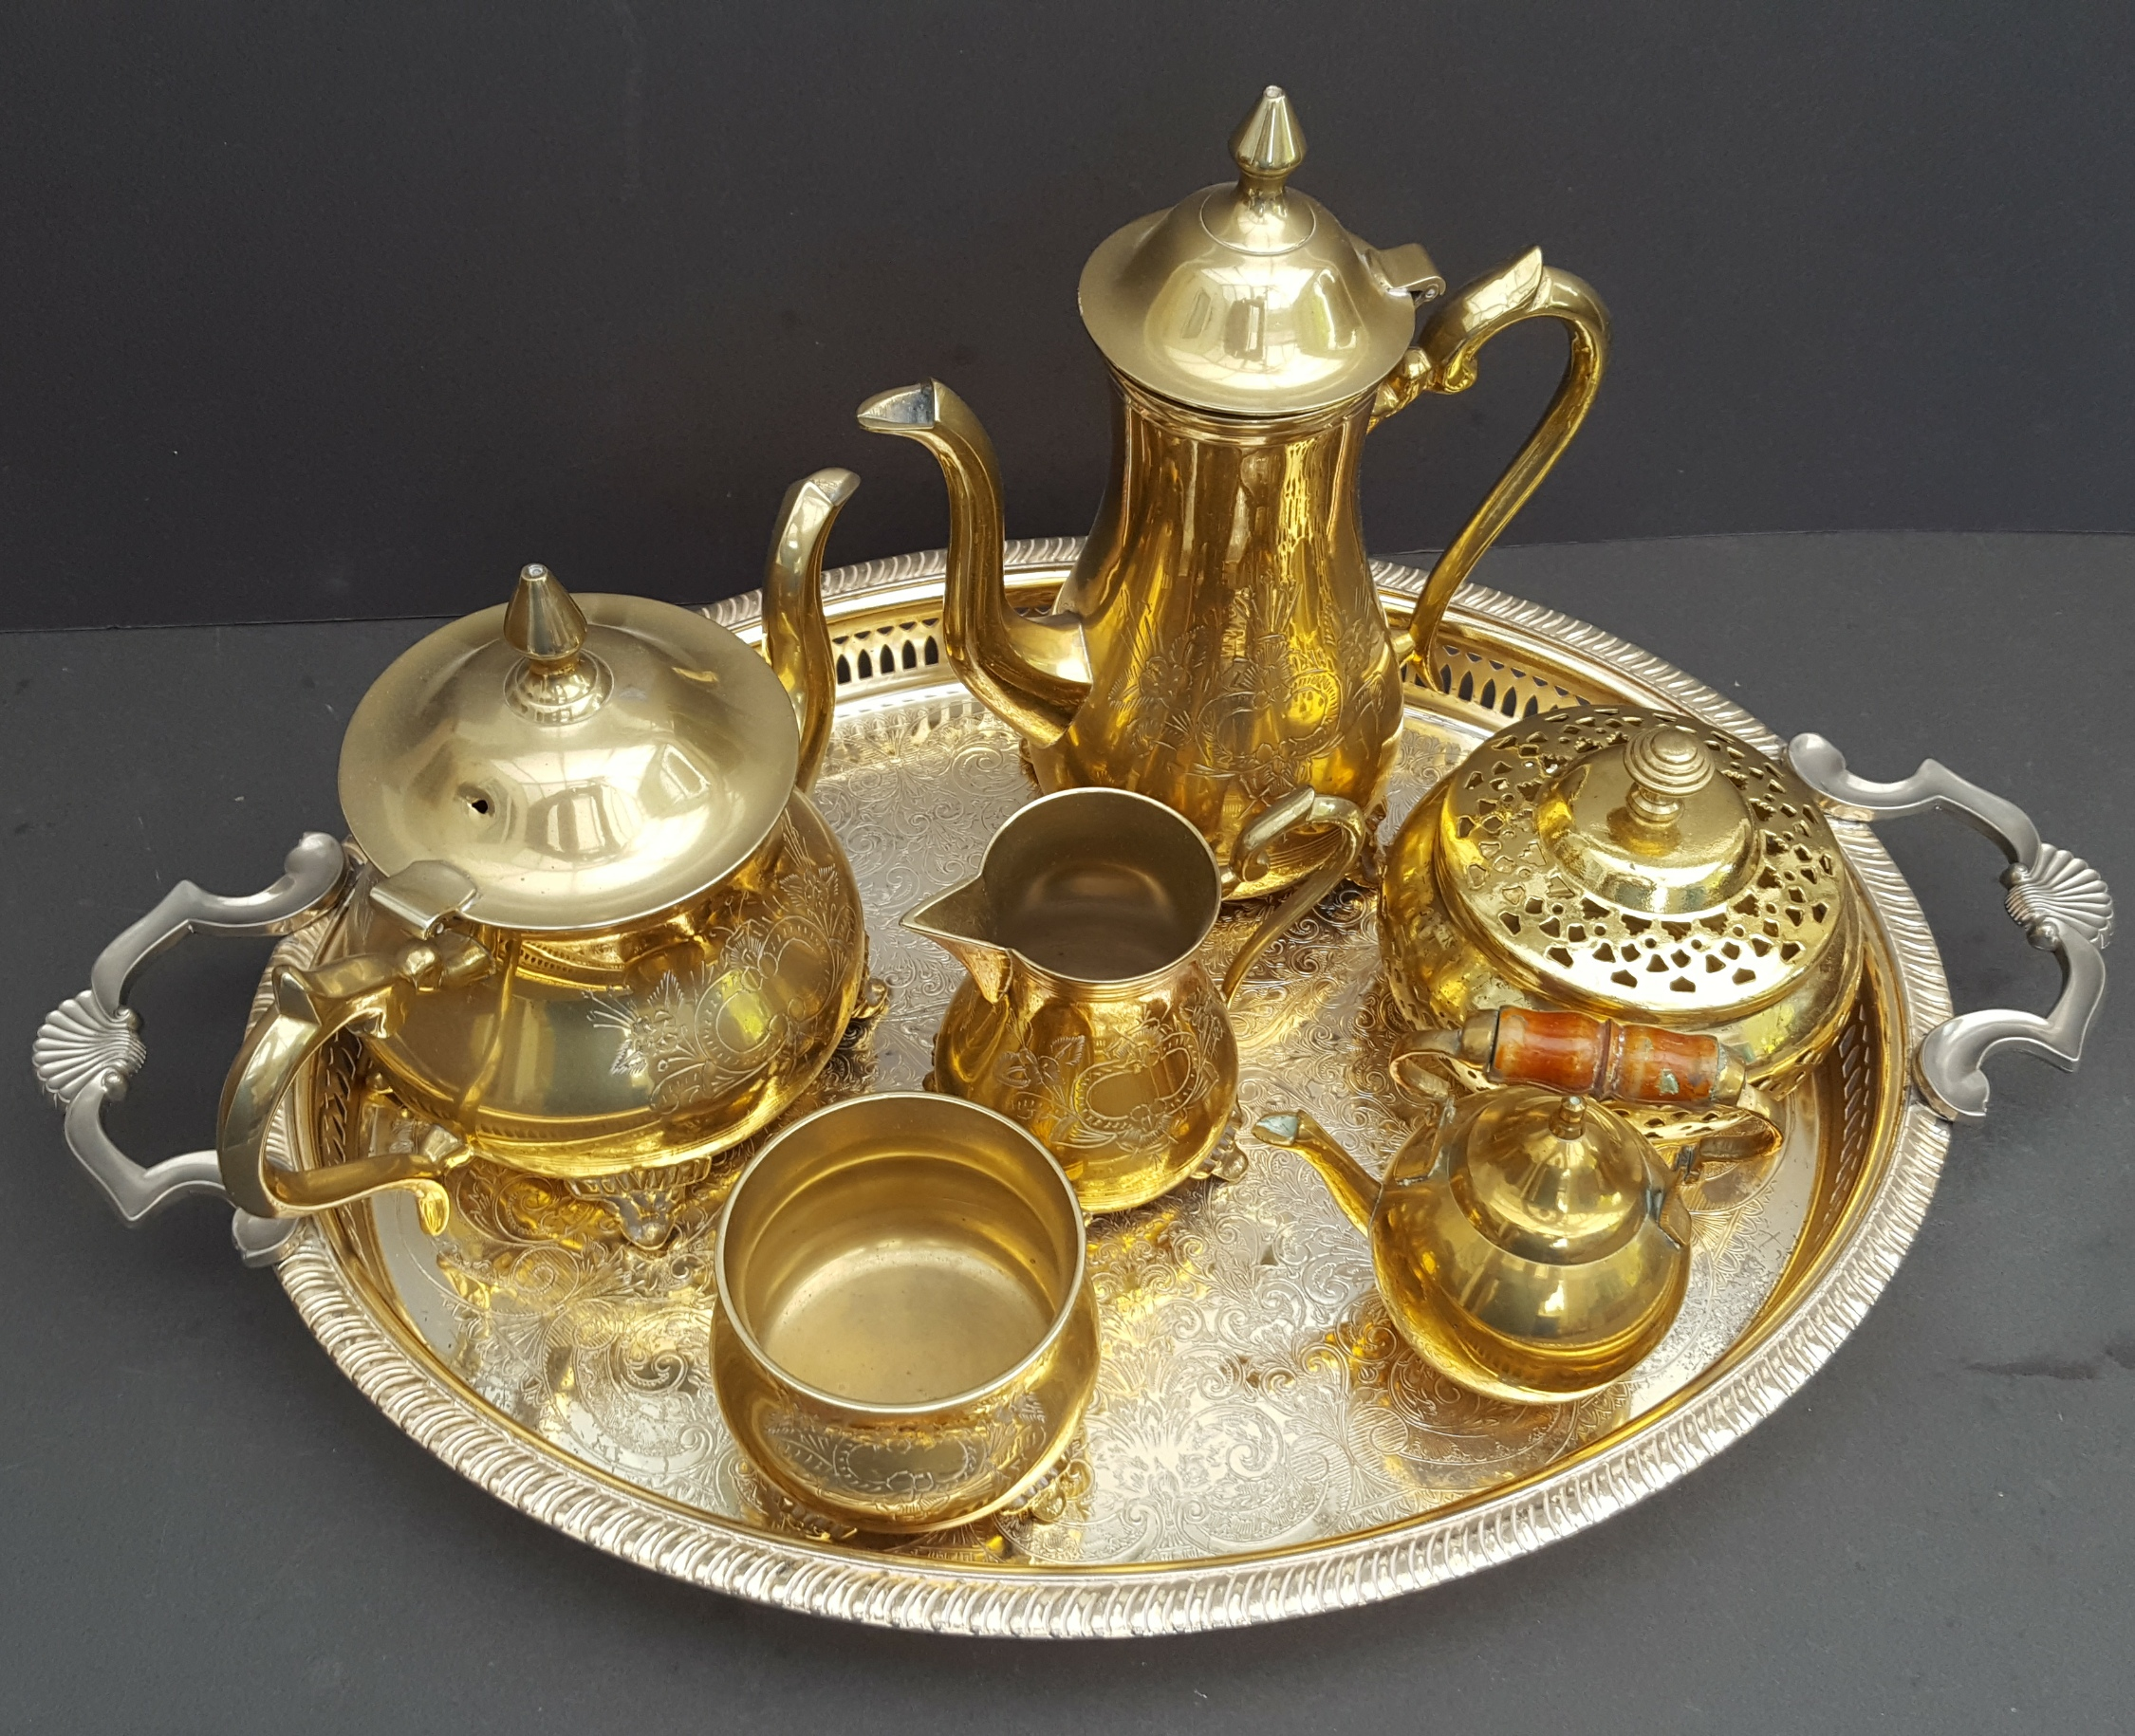 Lot 33 - Vintage Retro Tray of Brass Ware Includes Tea Pot Coffee Pot Jug etc NO RESERVE